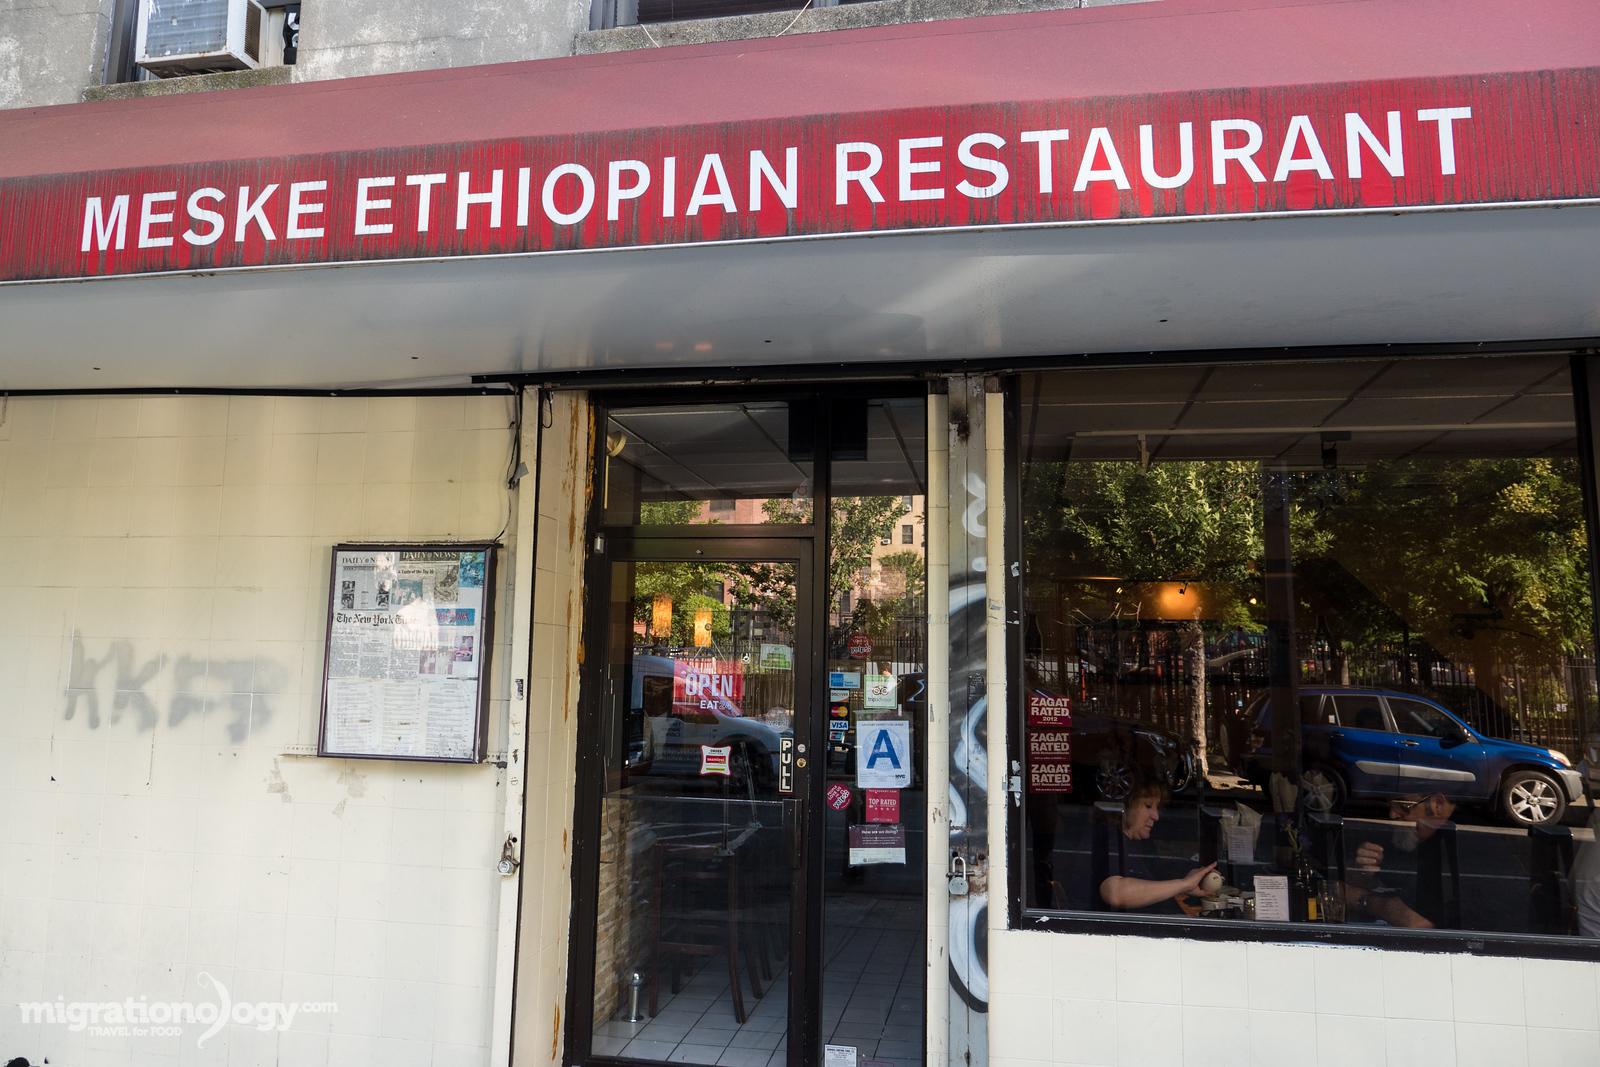 Meske Ethiopian Restaurant